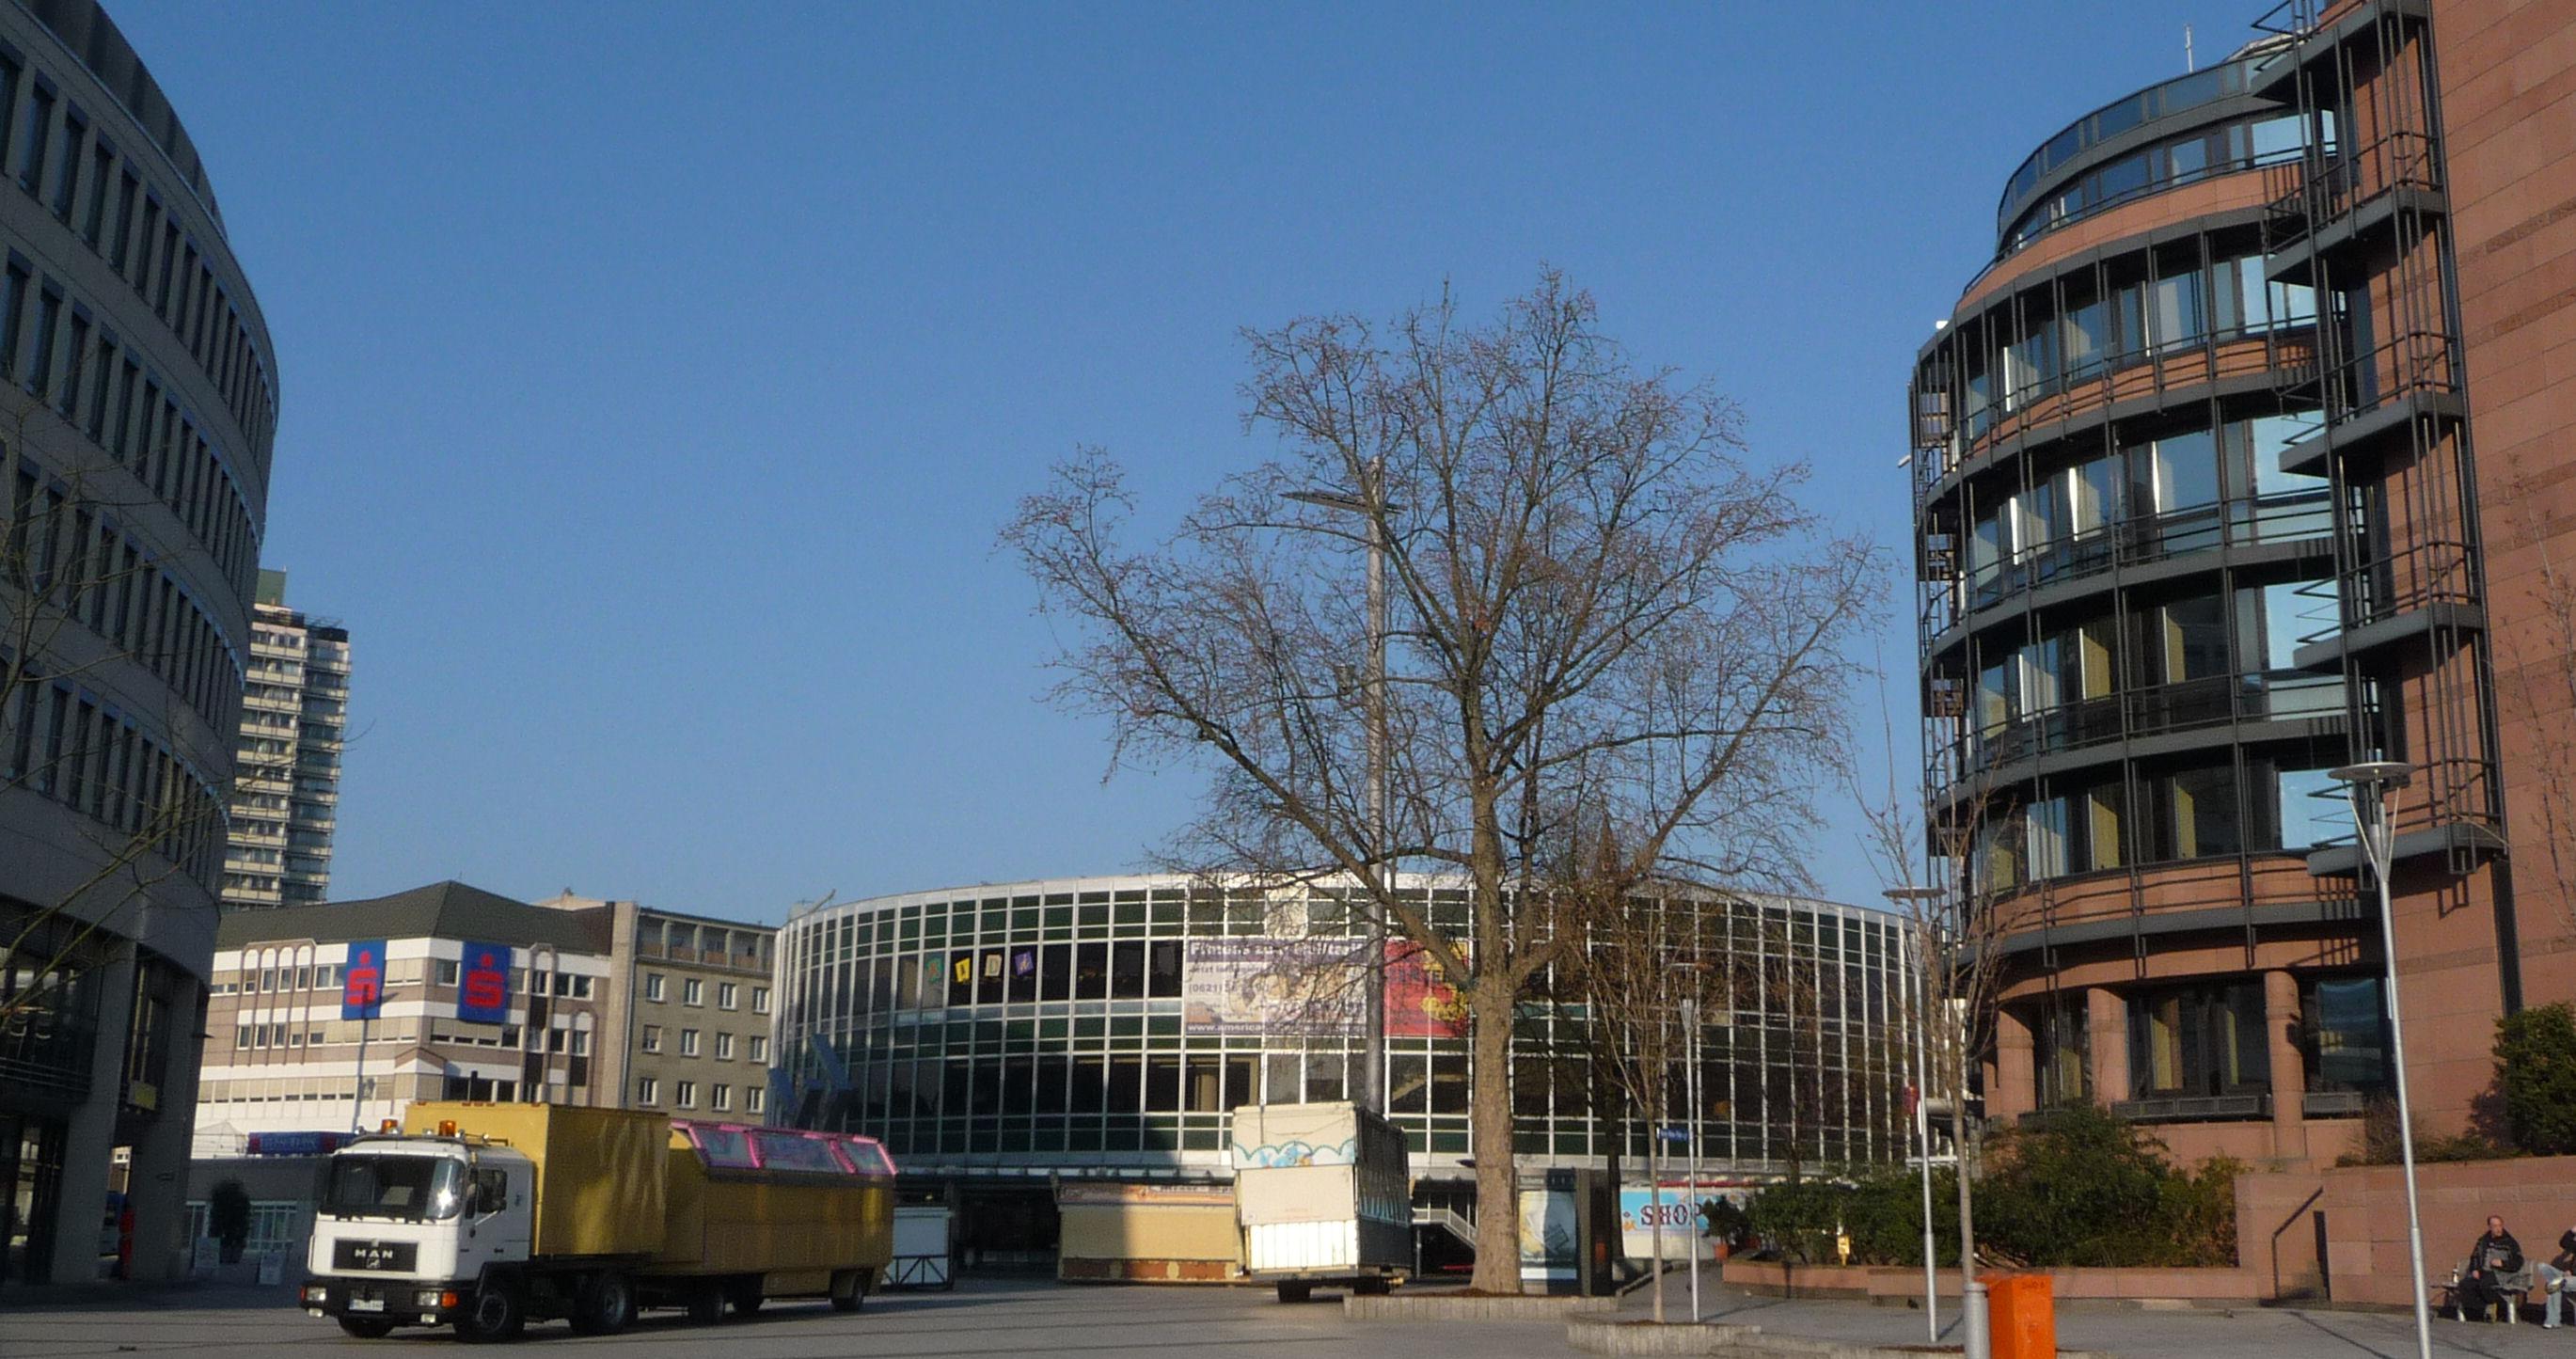 Berliner Platz Ludwigshafen Wikipedia